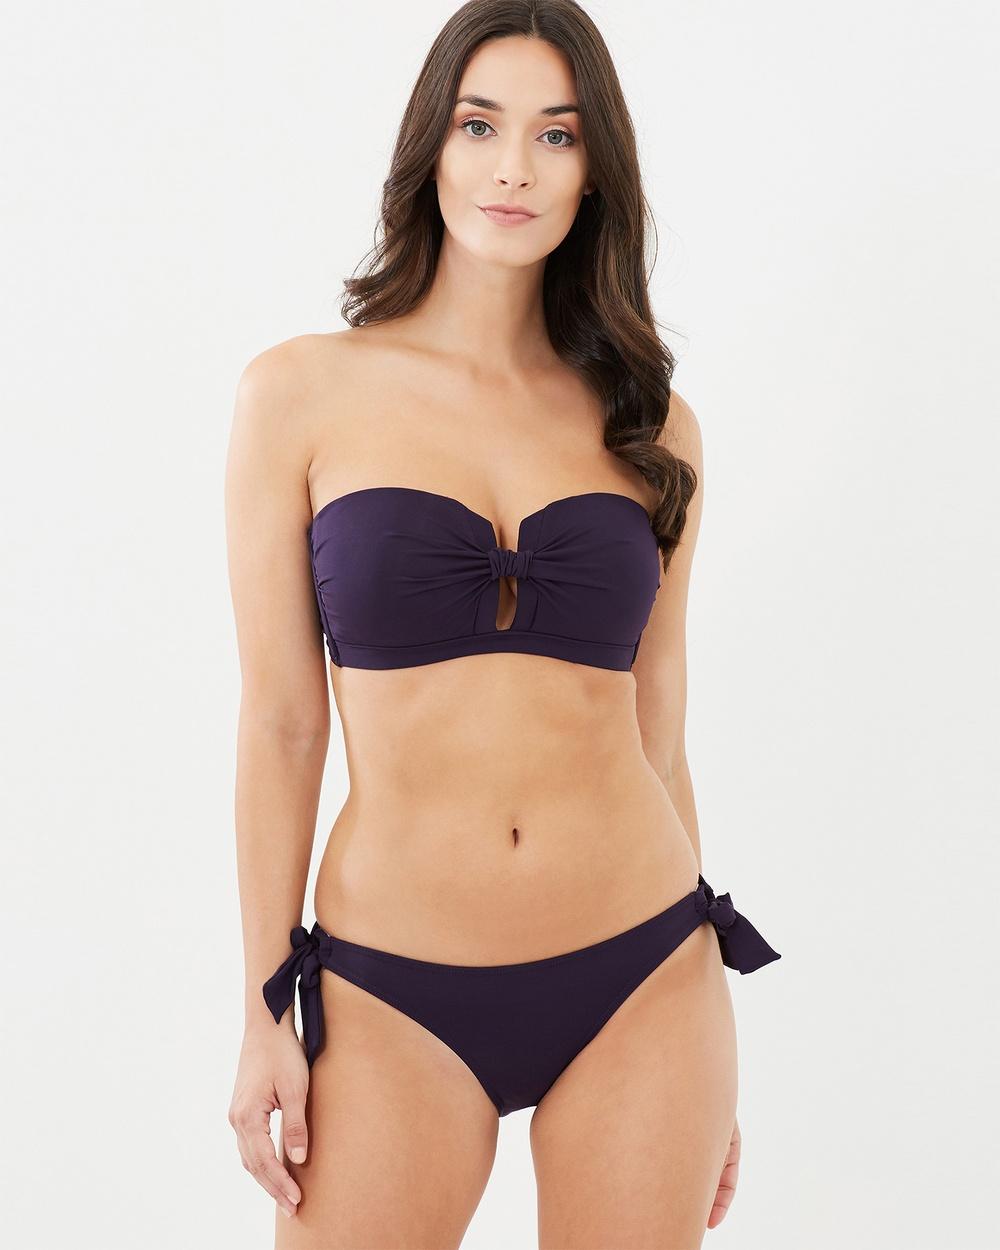 JETS Tab Front Bandeau Bikini Tops Multi Tab Front Bandeau